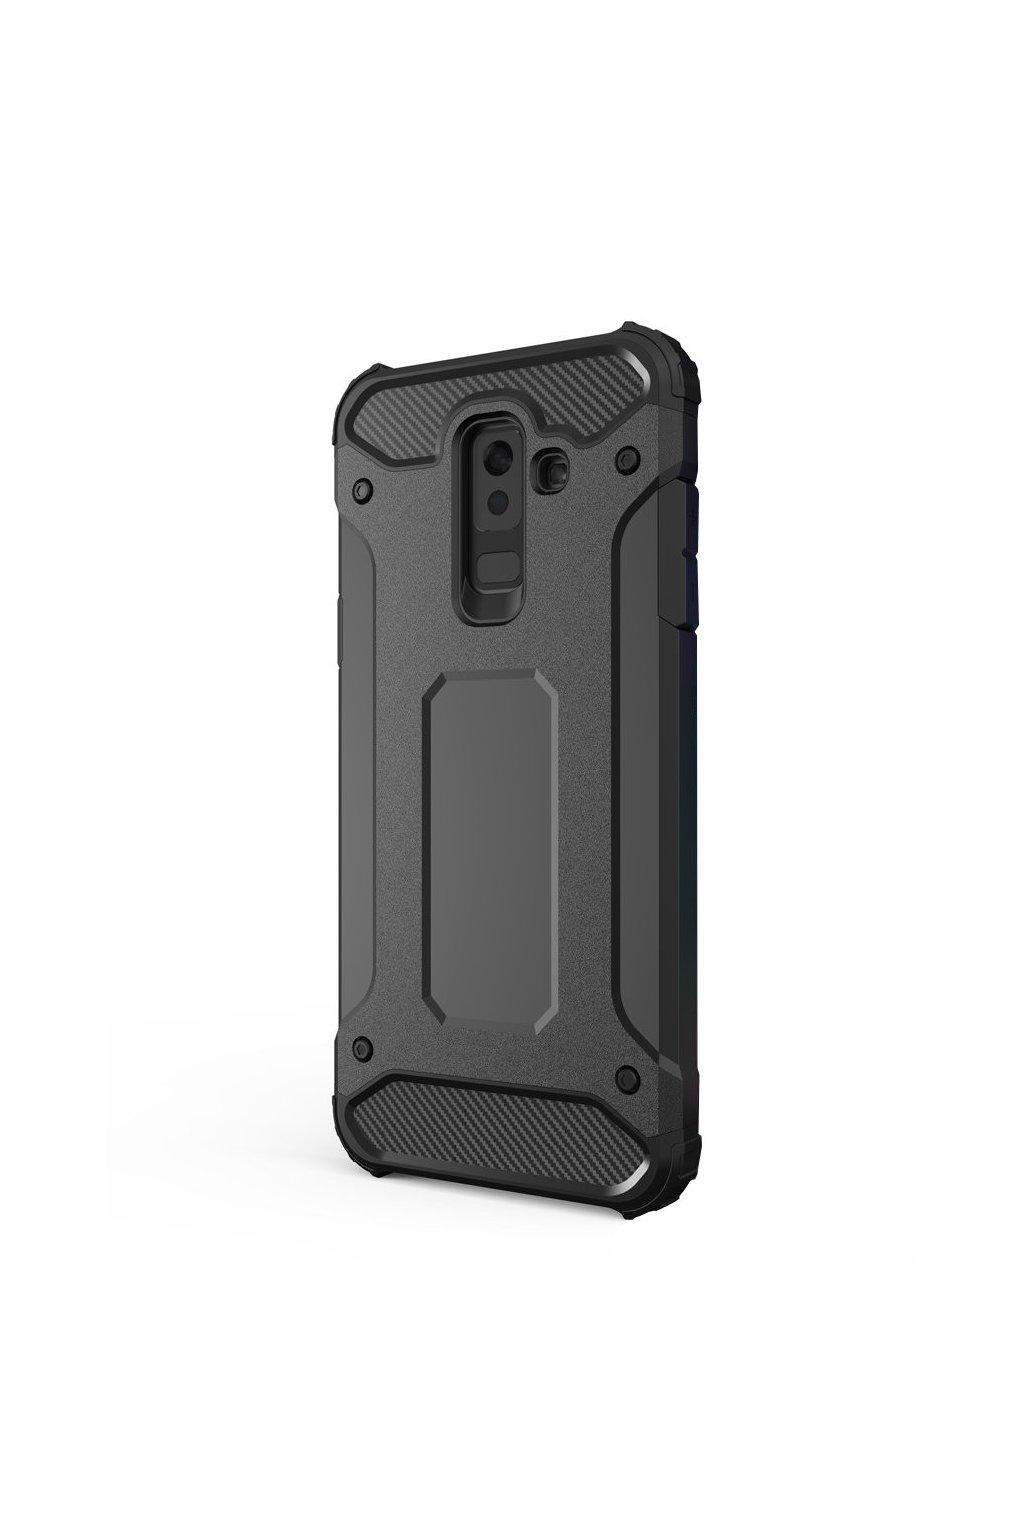 aeng pl Hybrid Armor Case Tough Rugged Cover for Samsung Galaxy A6 Plus 2018 A605 black 42381 1